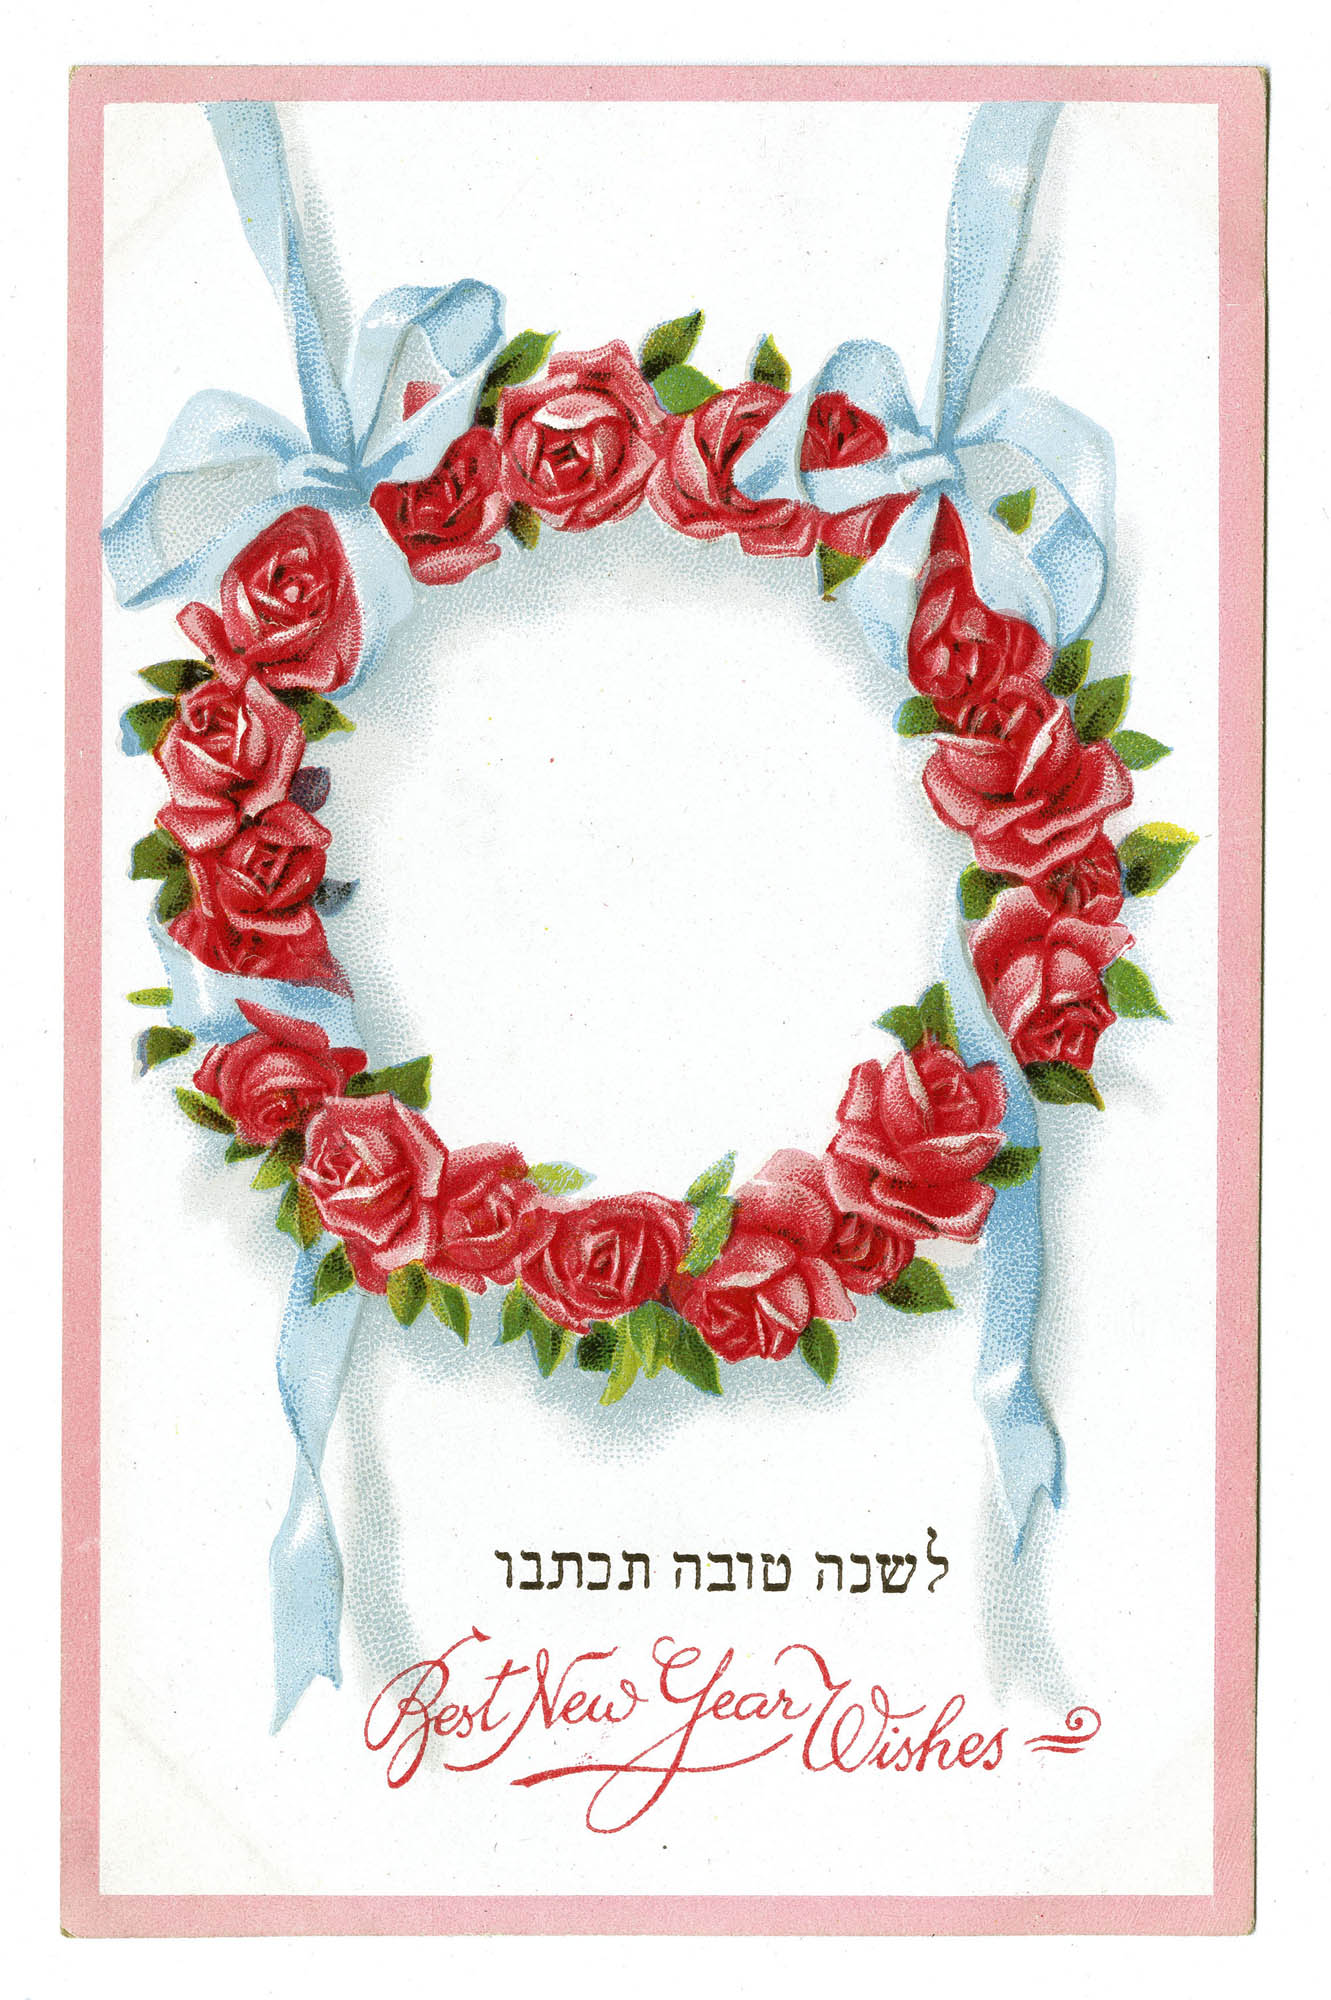 Best New Year Wishes / לשנה טובה תכתבו